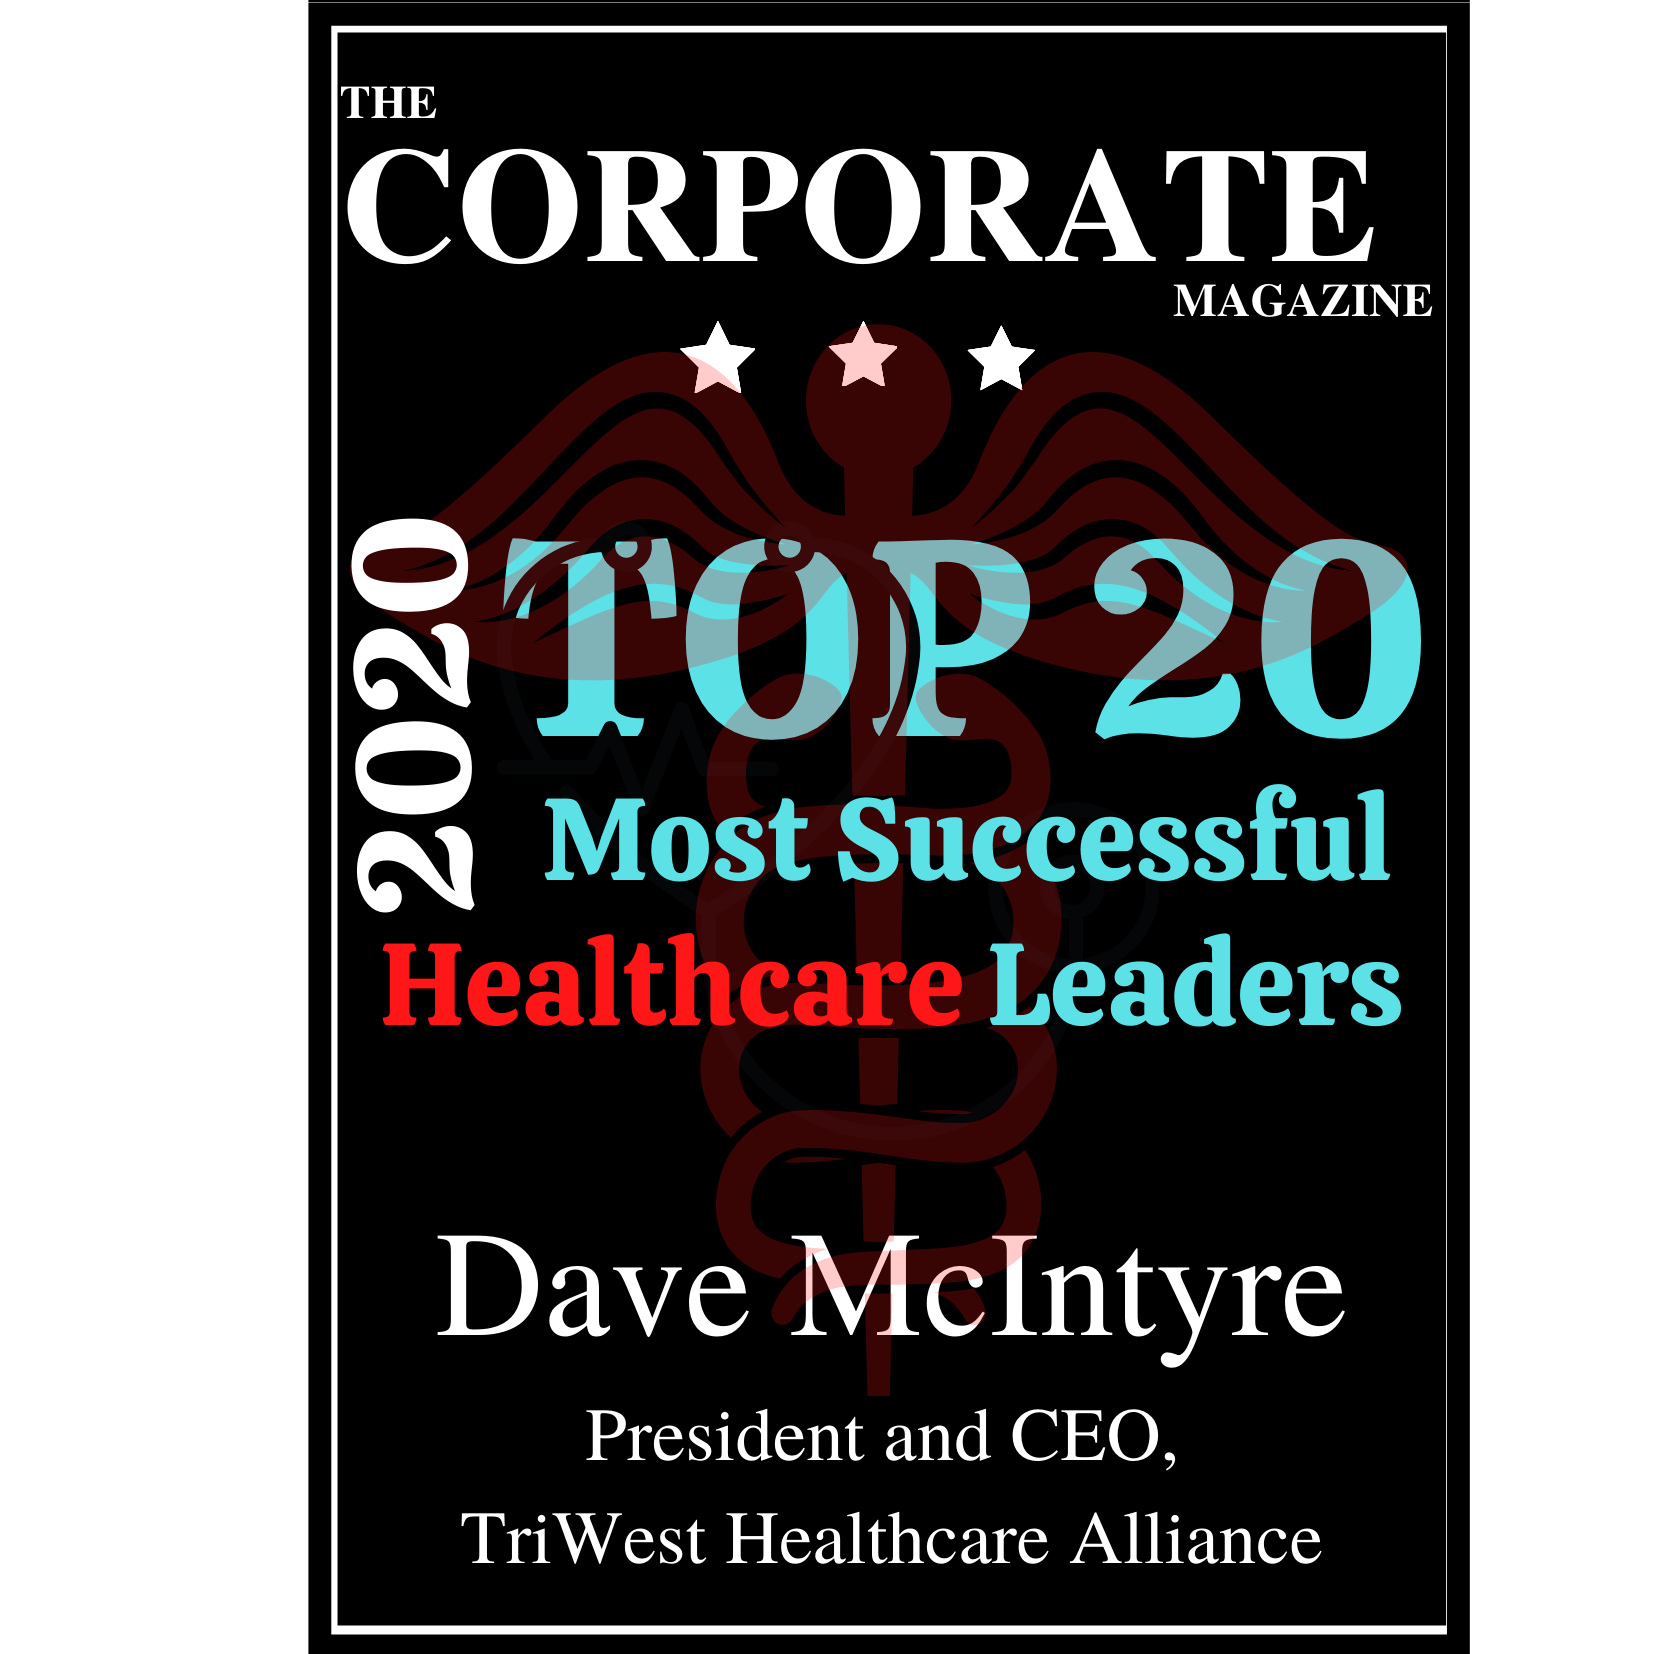 Dave McIntyre Top Healthcare leader